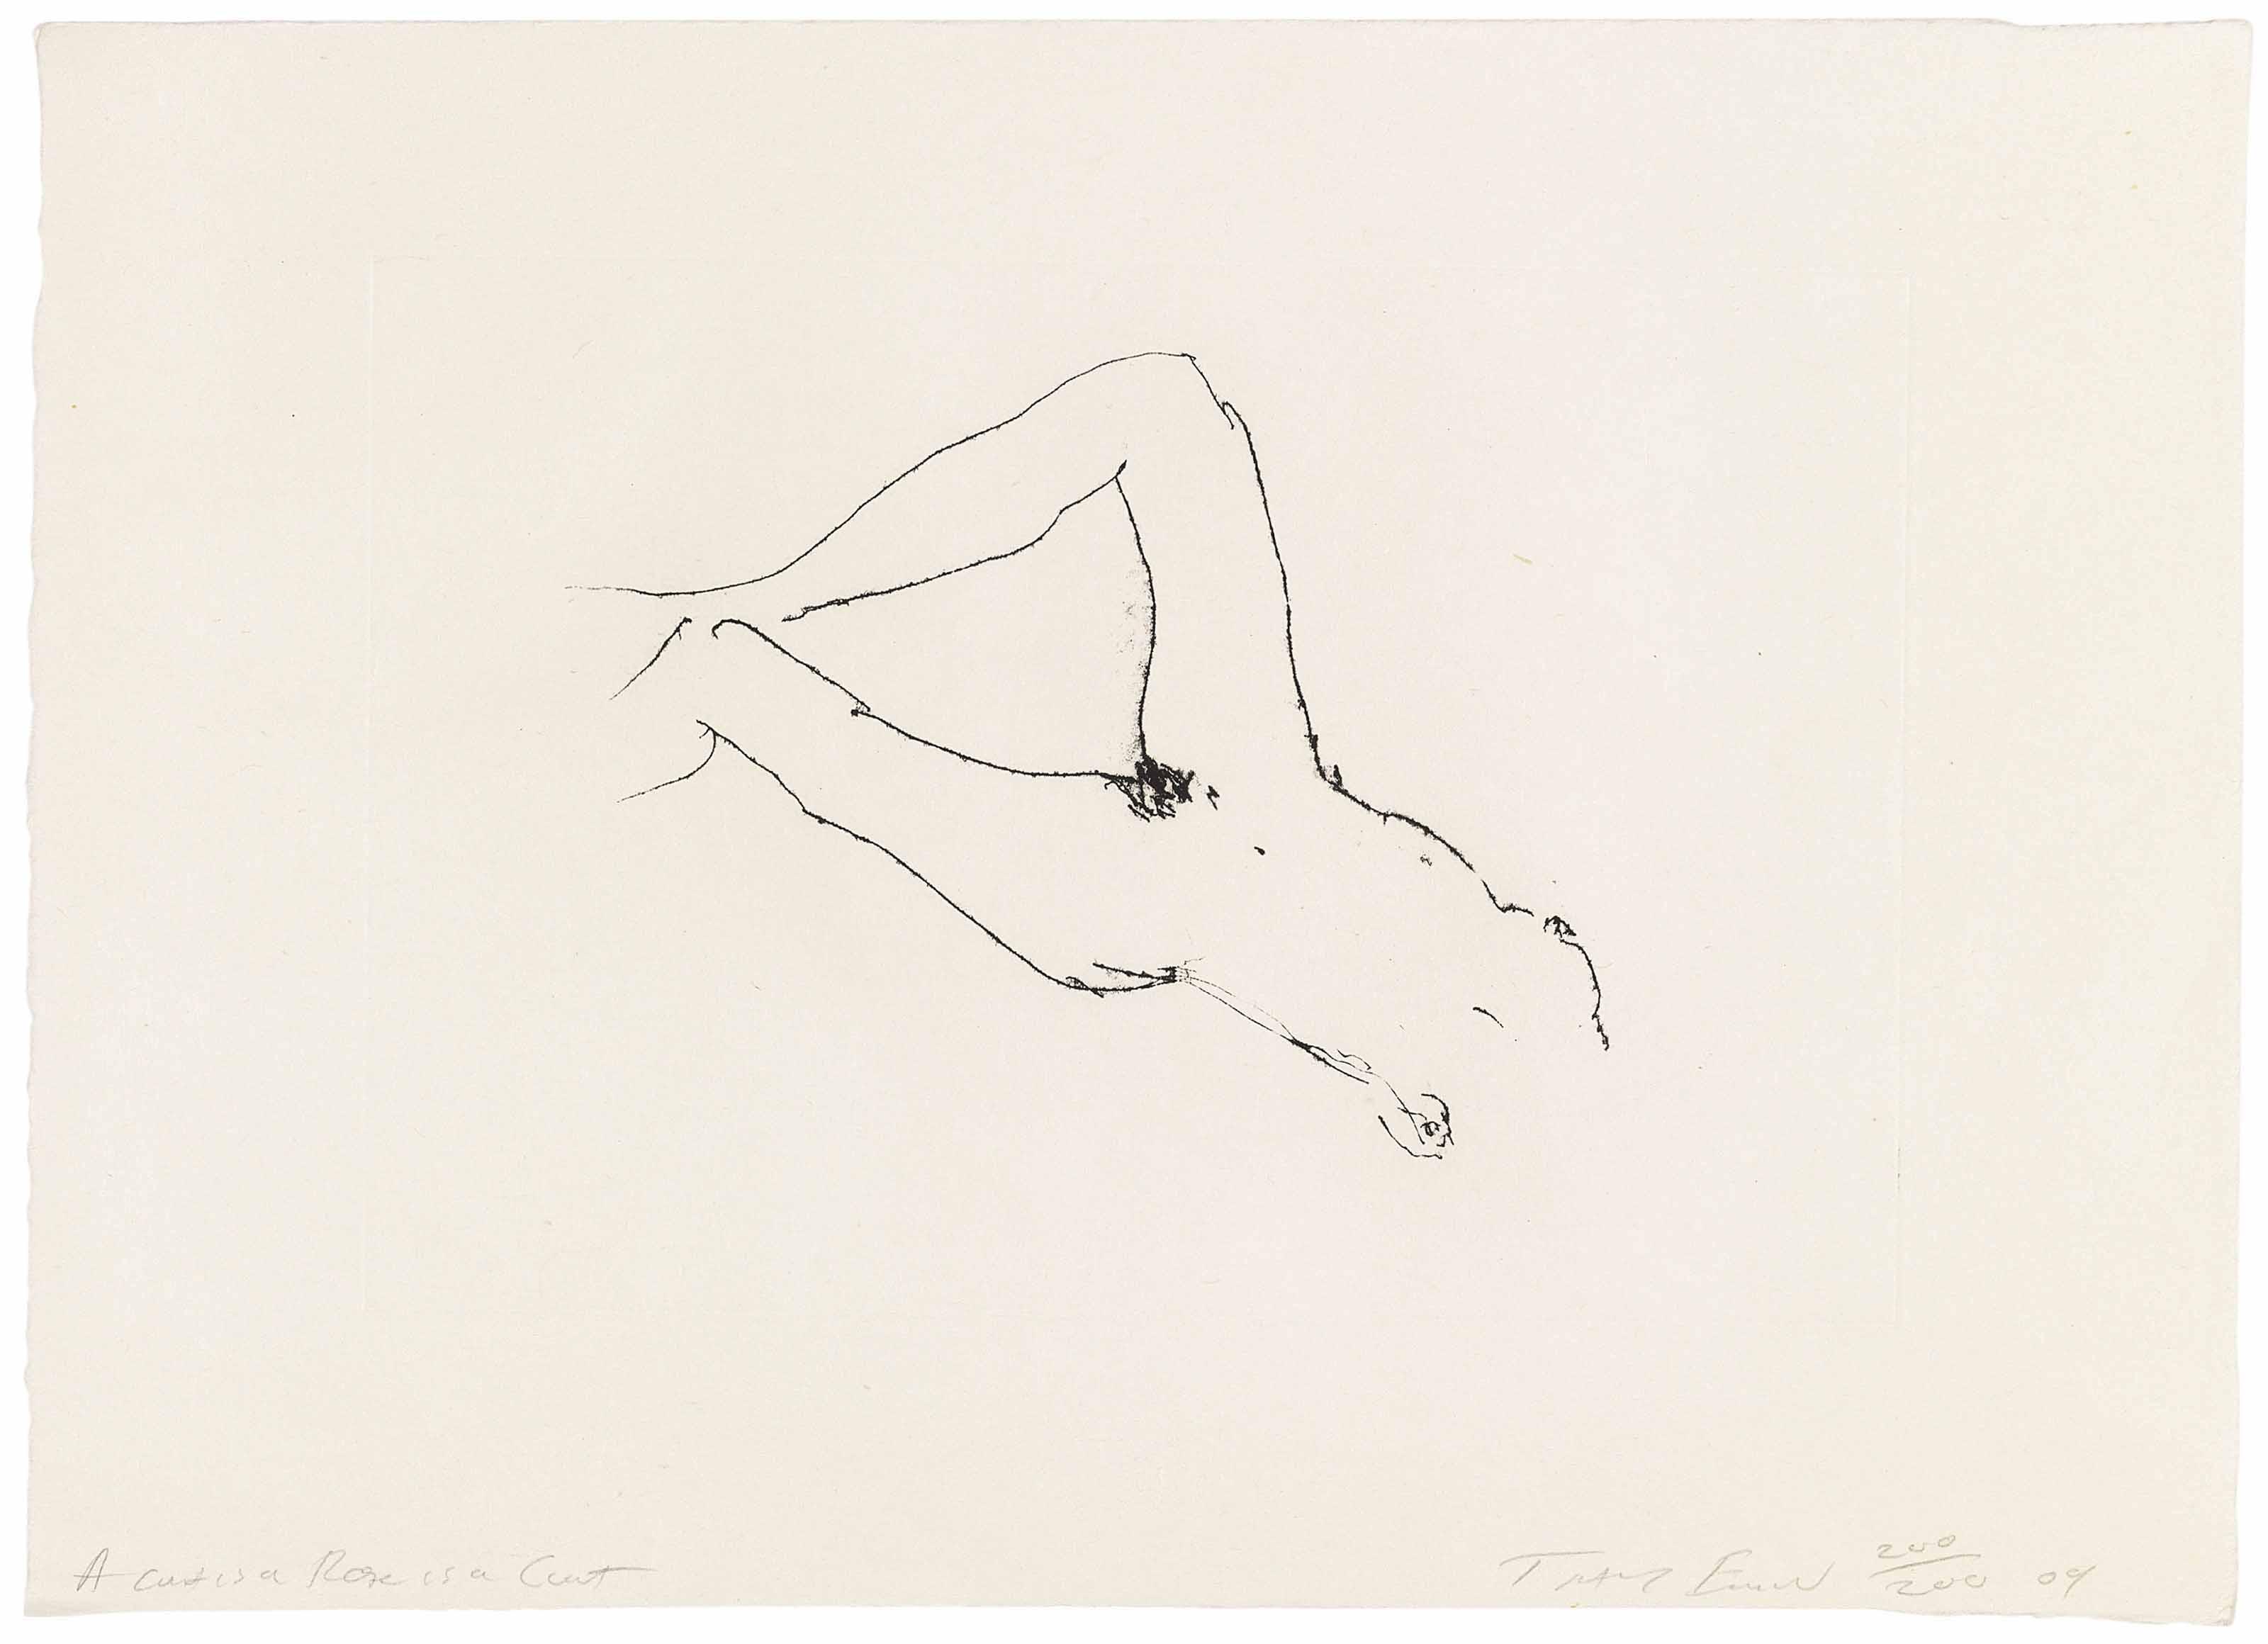 TRACEY EMIN (BRITISH, B. 1963)